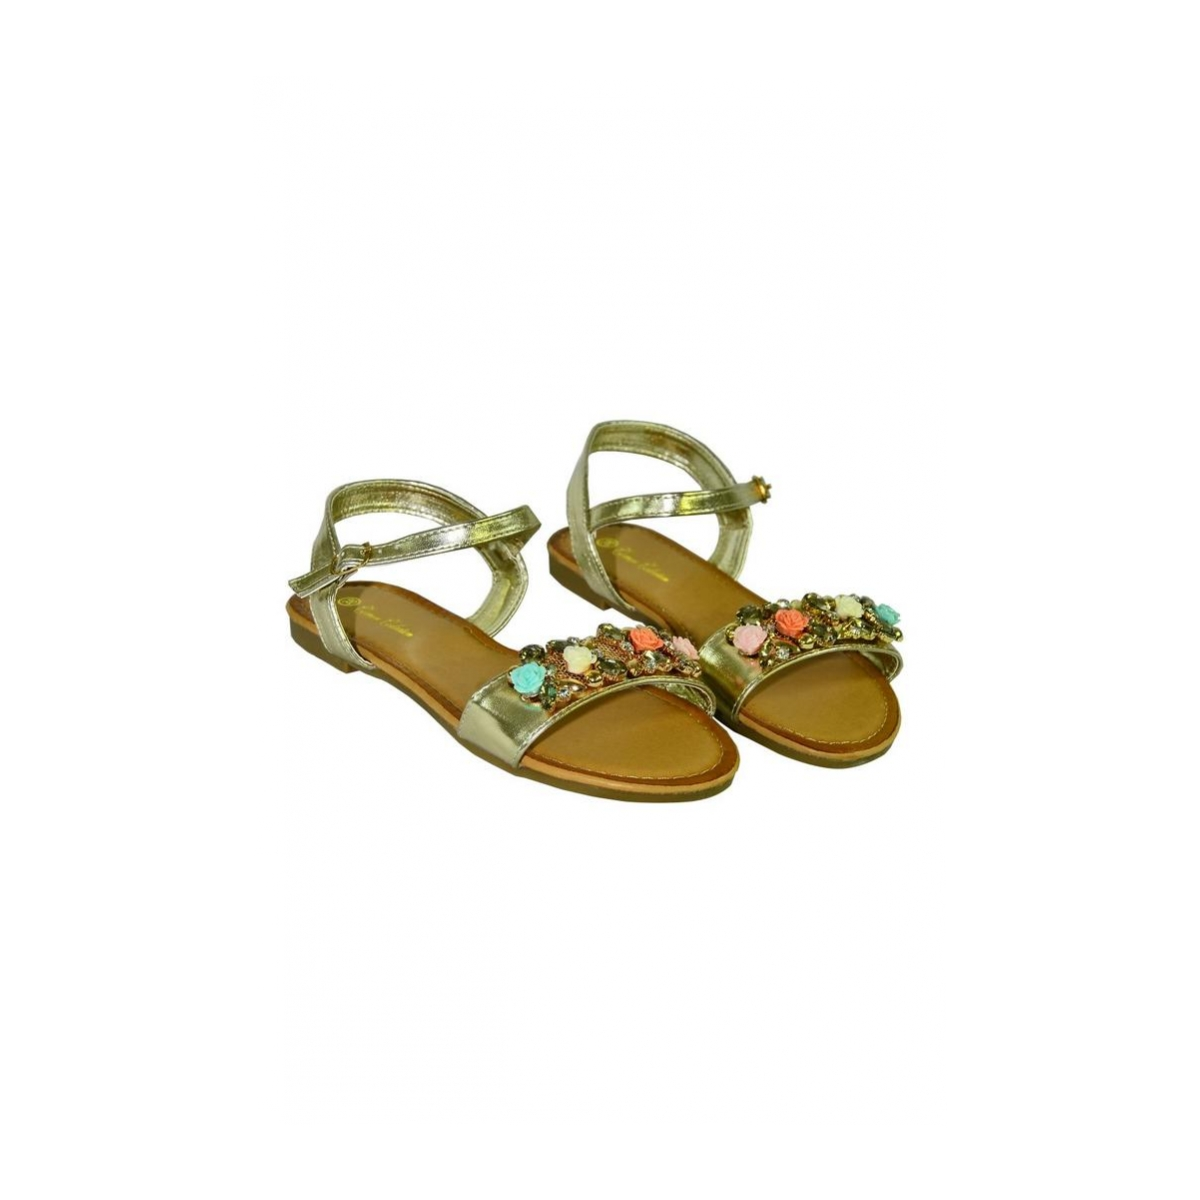 7103133273c6 Zlaté nízke sandále s kvietkami SAGE - 2